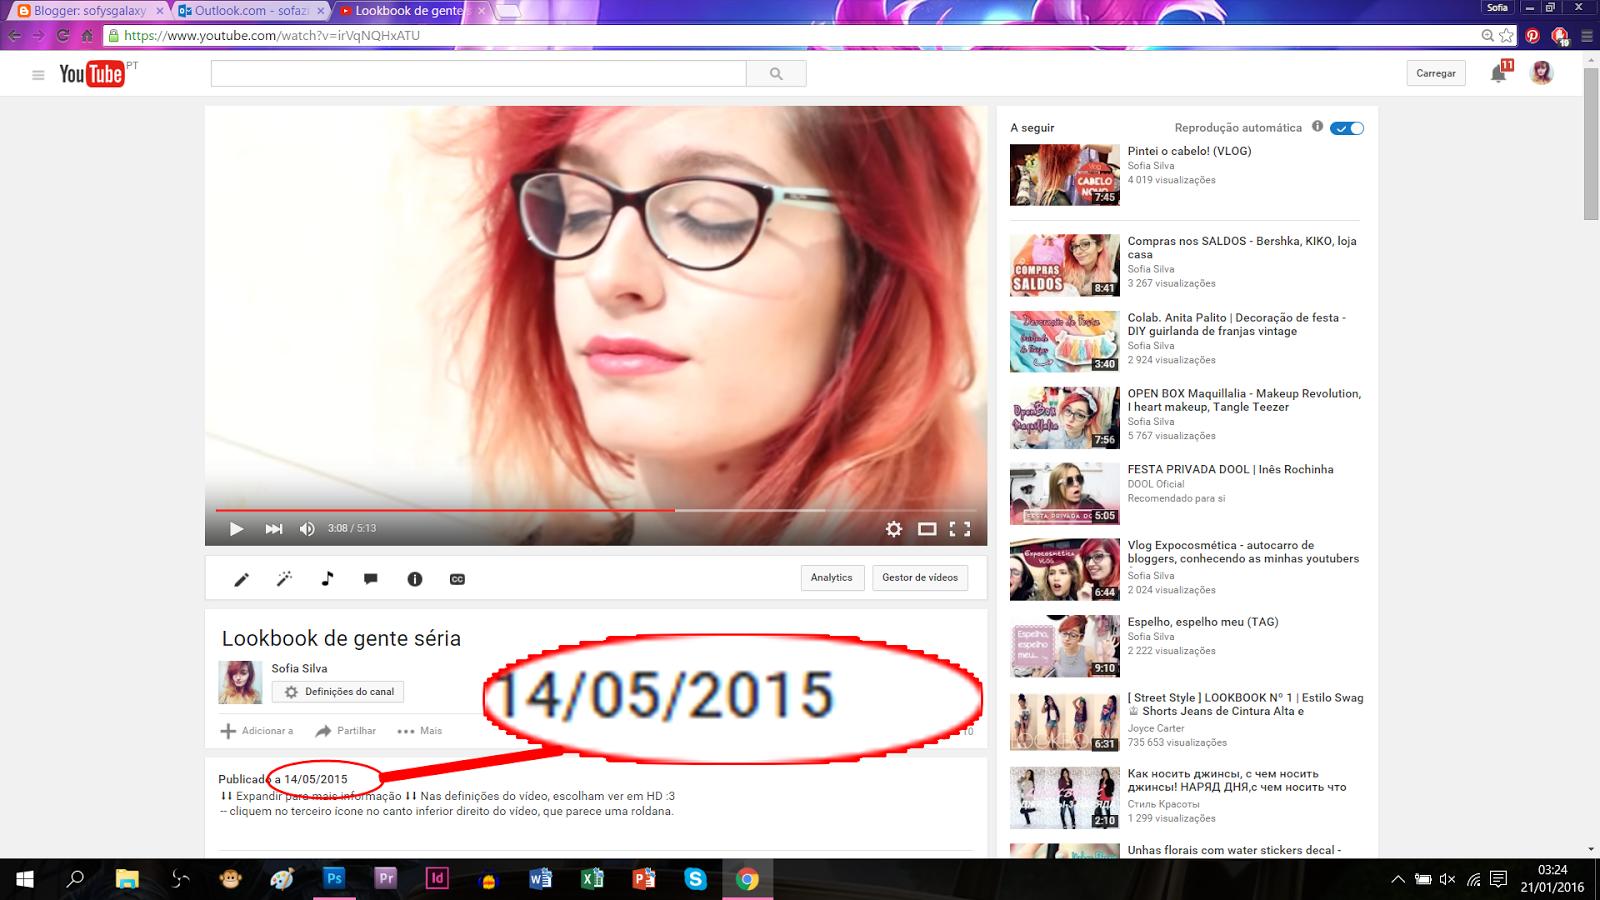 Last youtube video (date proof)